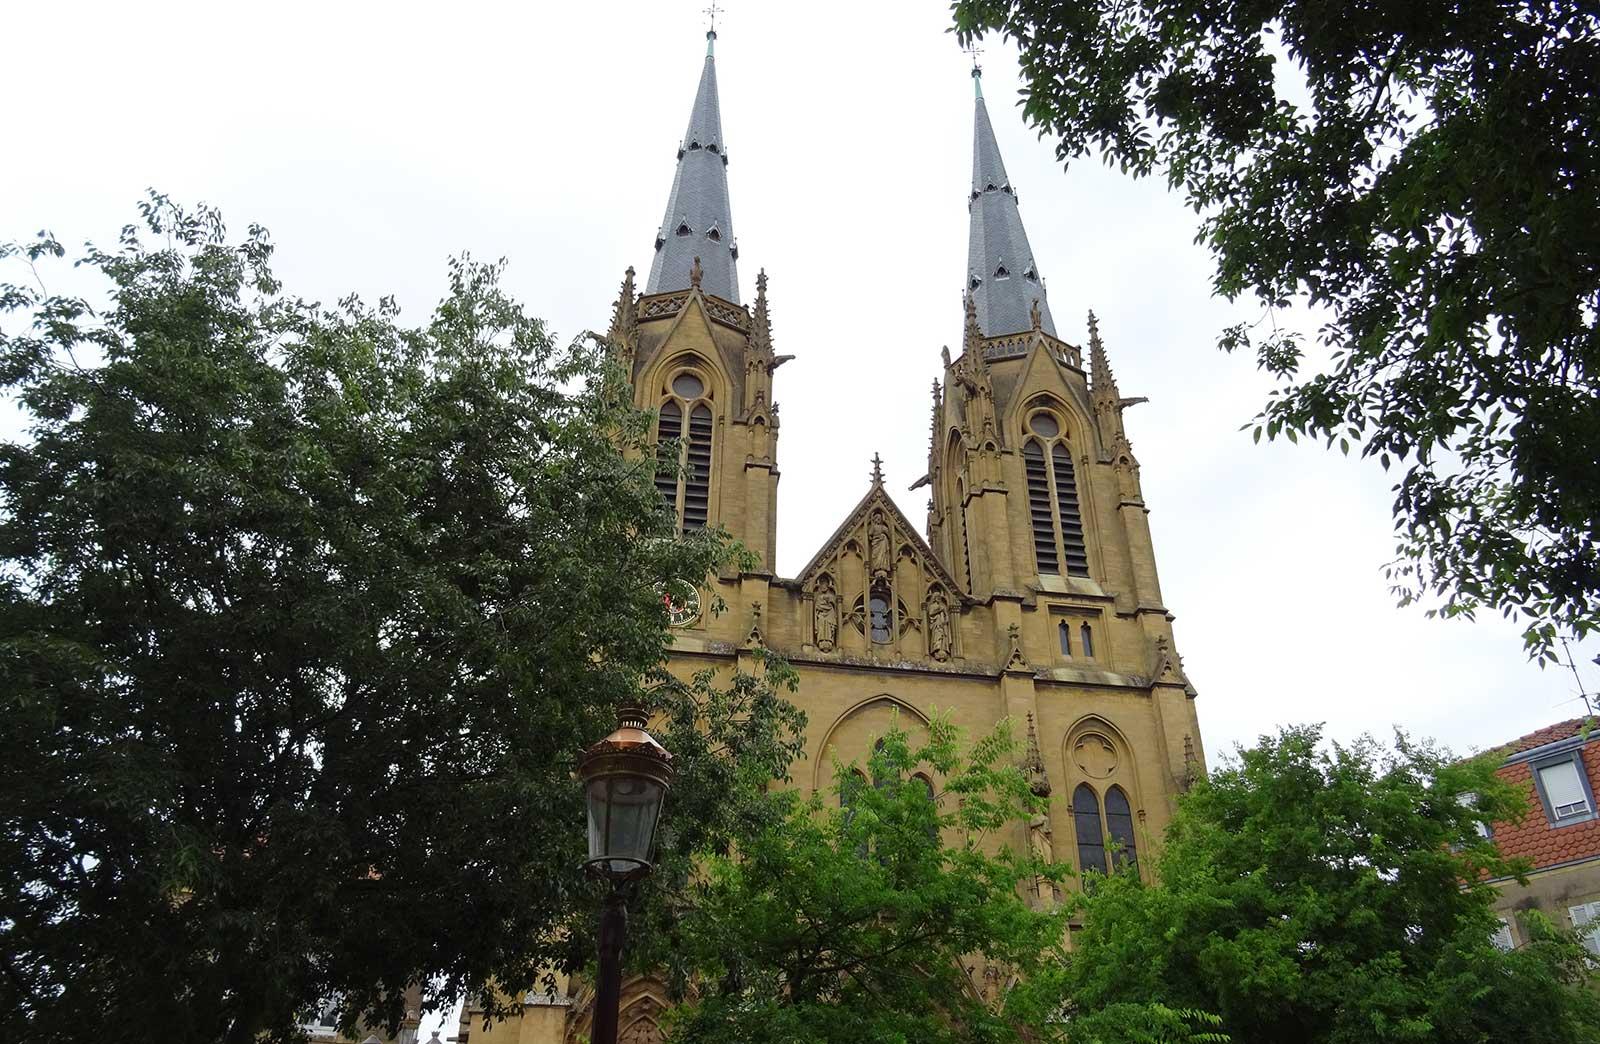 Eglise Sainte Ségolène